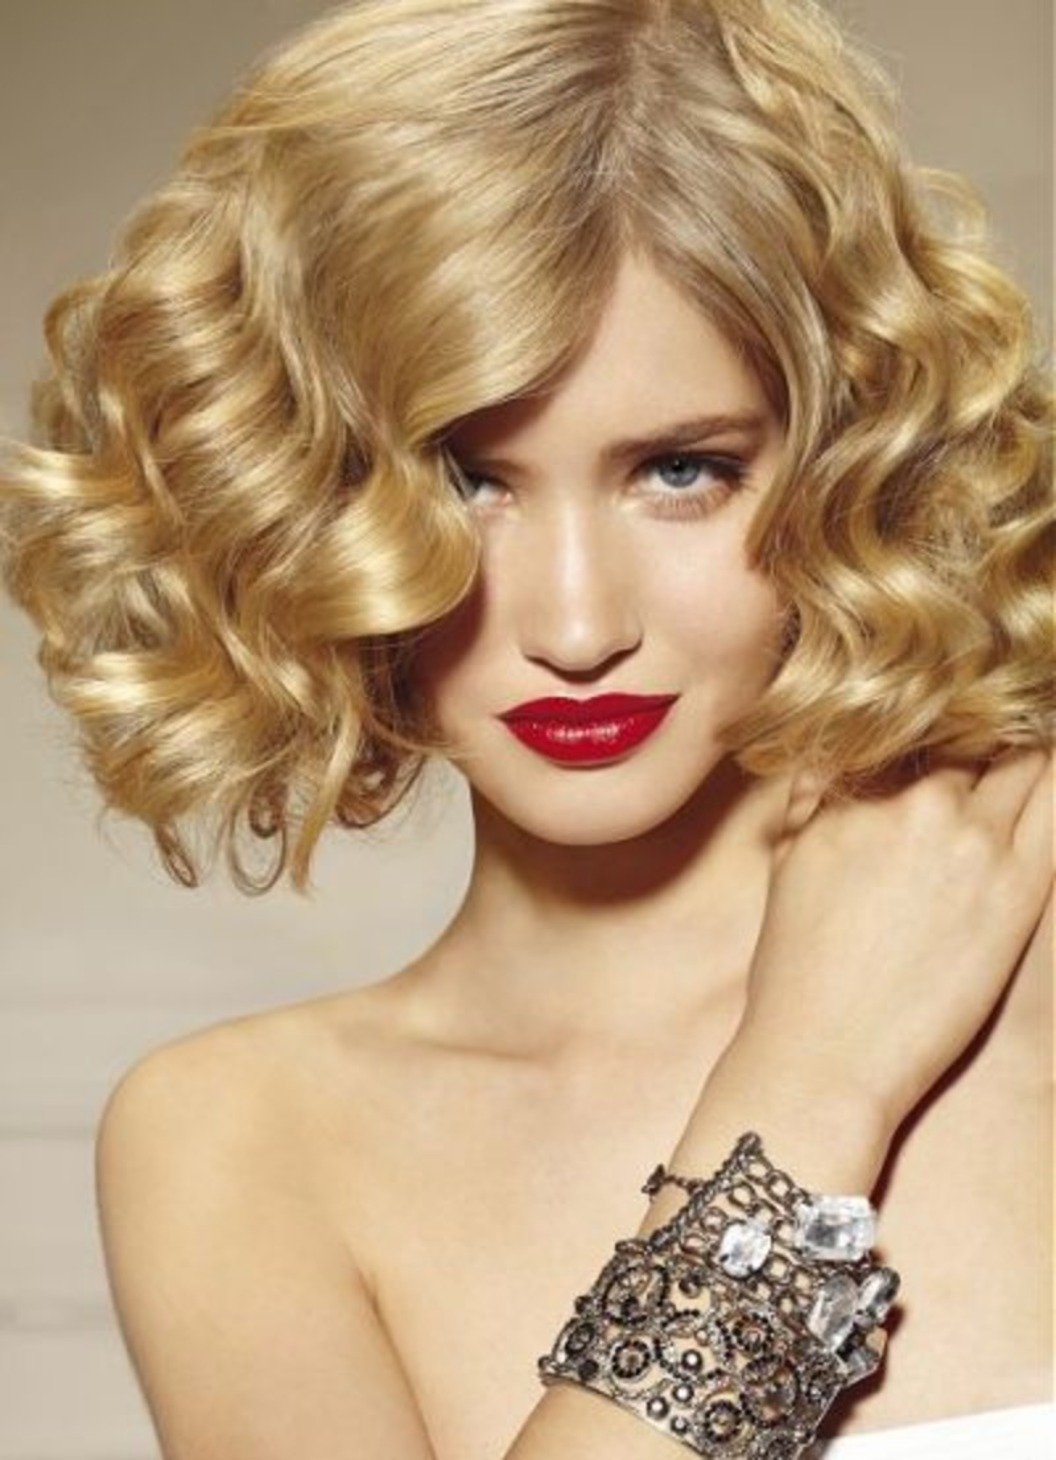 Фото с прическами на средние волосы кудри